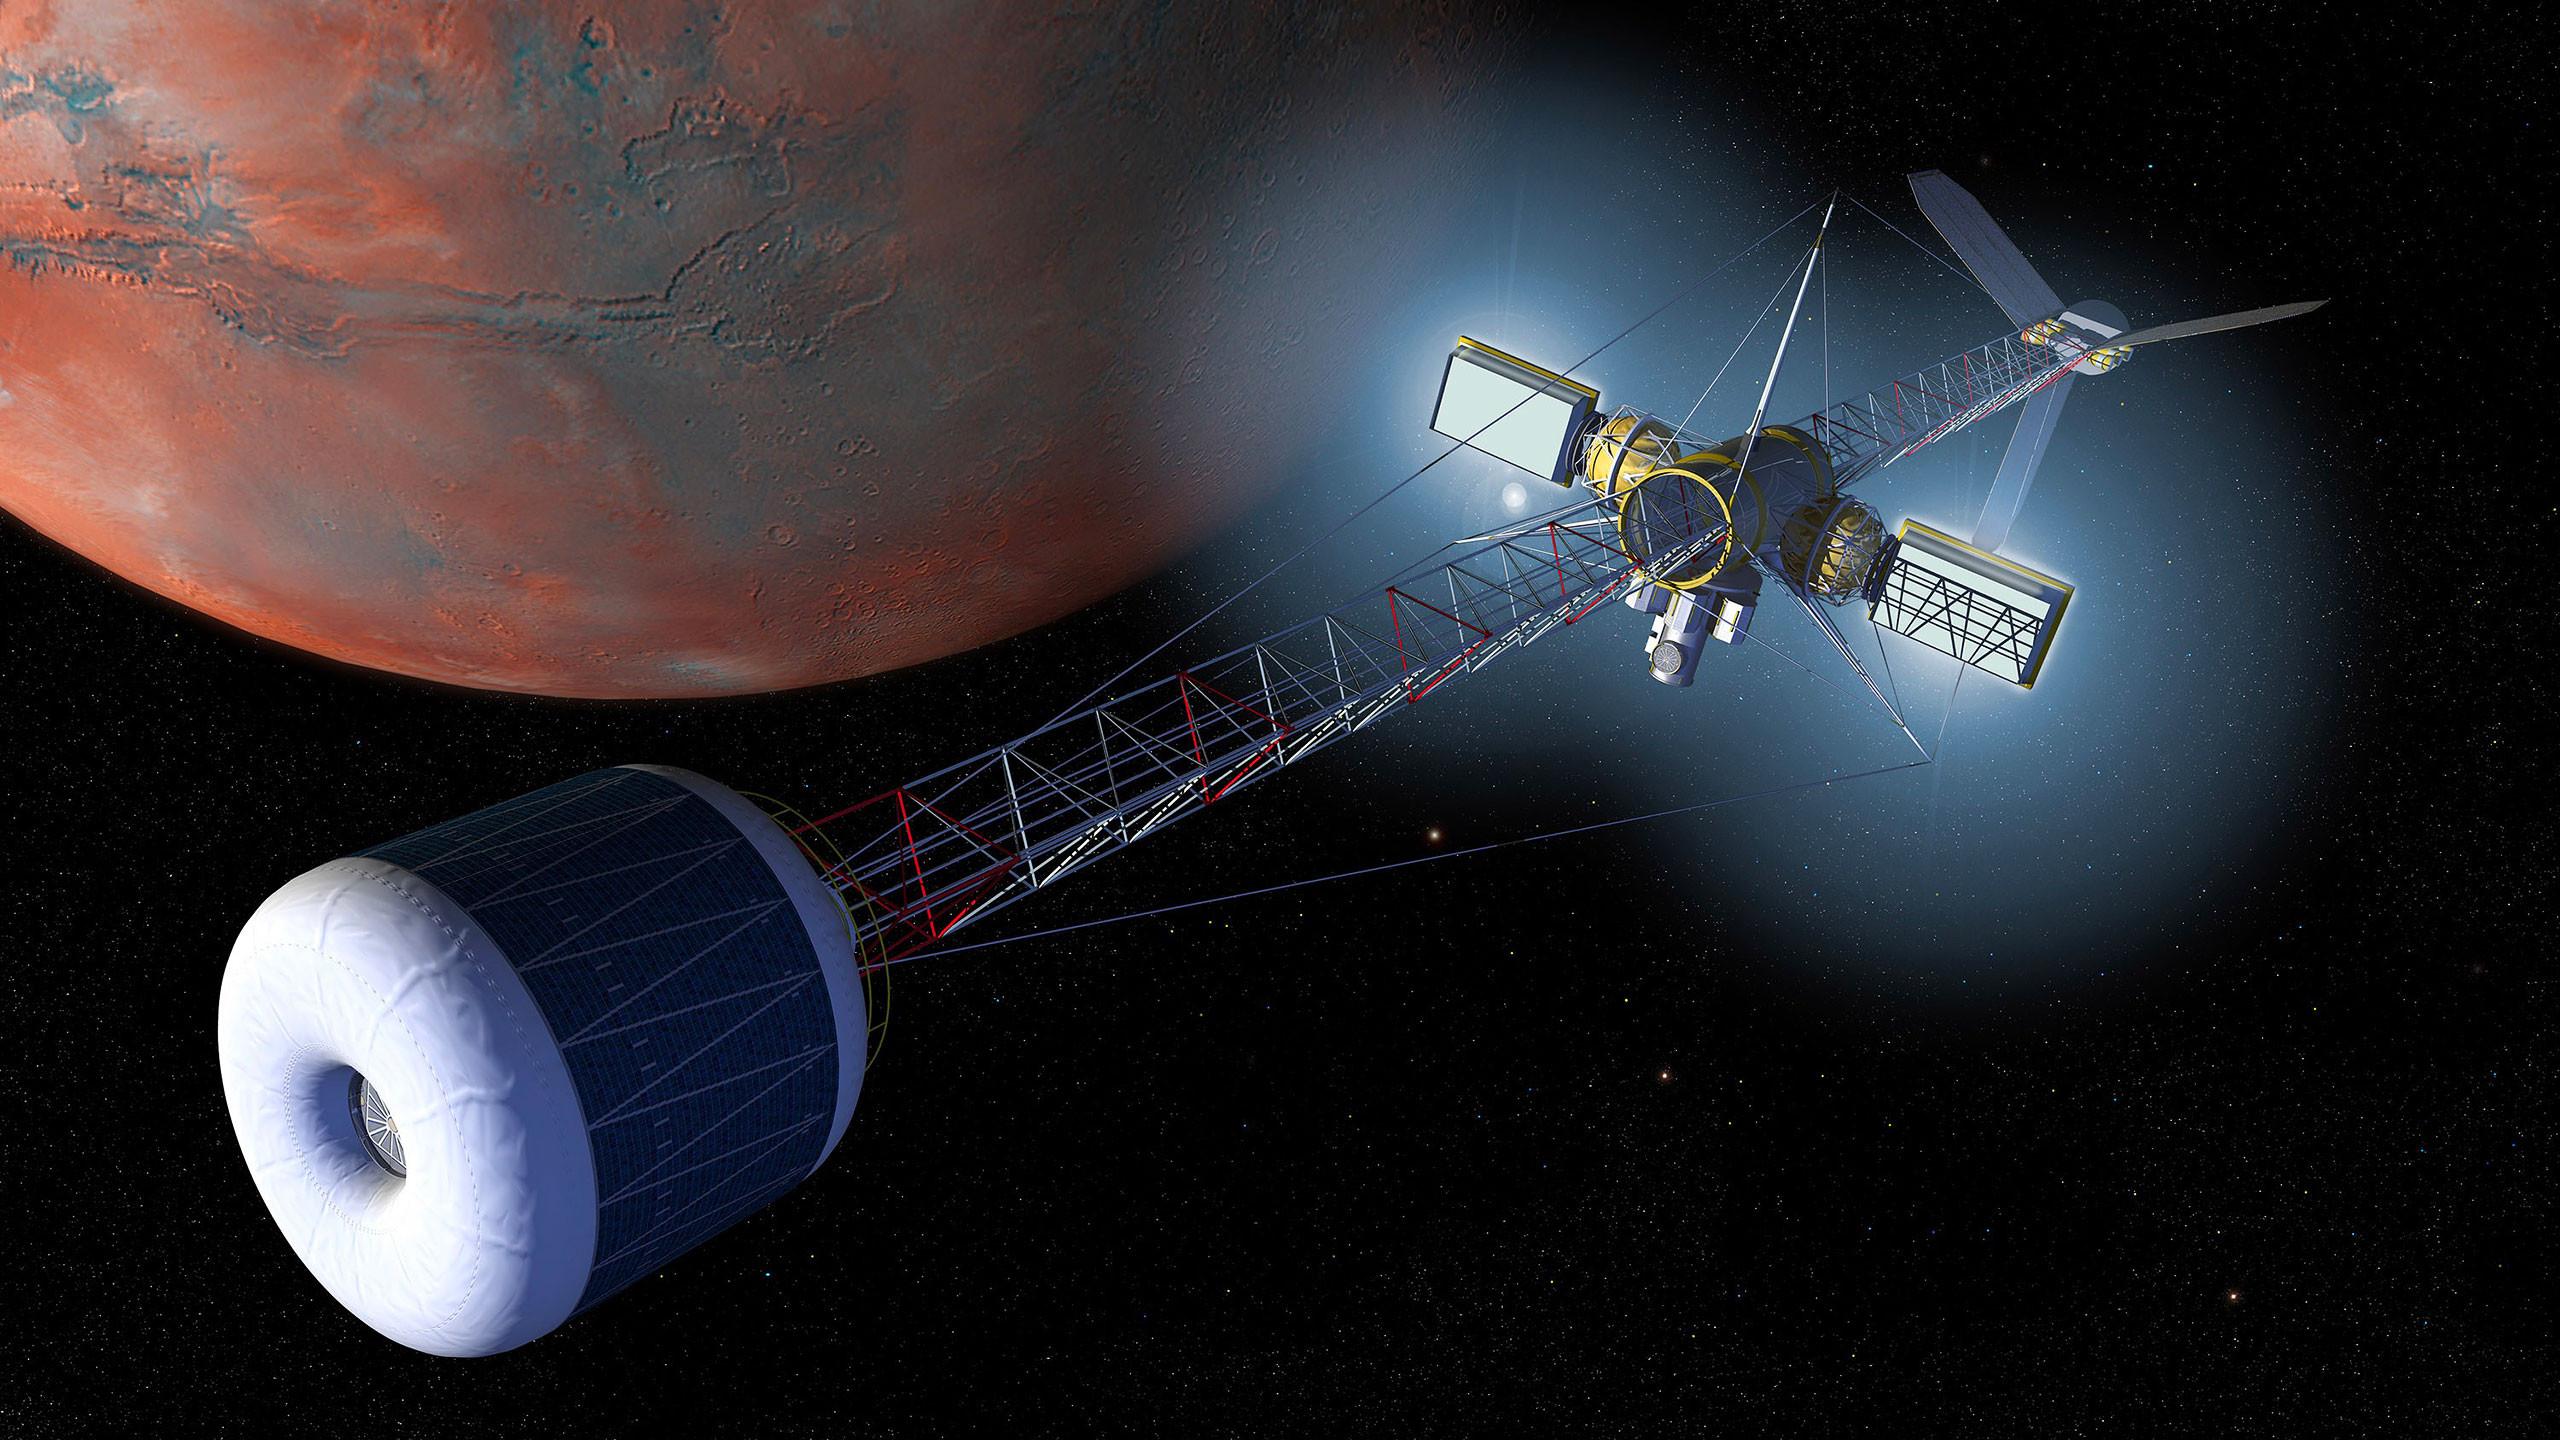 "<p>Фото: &copy; Flickr /<span> <a href=""https://www.flickr.com/photos/nasa2explore/"" target=""_blank"">NASA Johnson</a></span></p>"